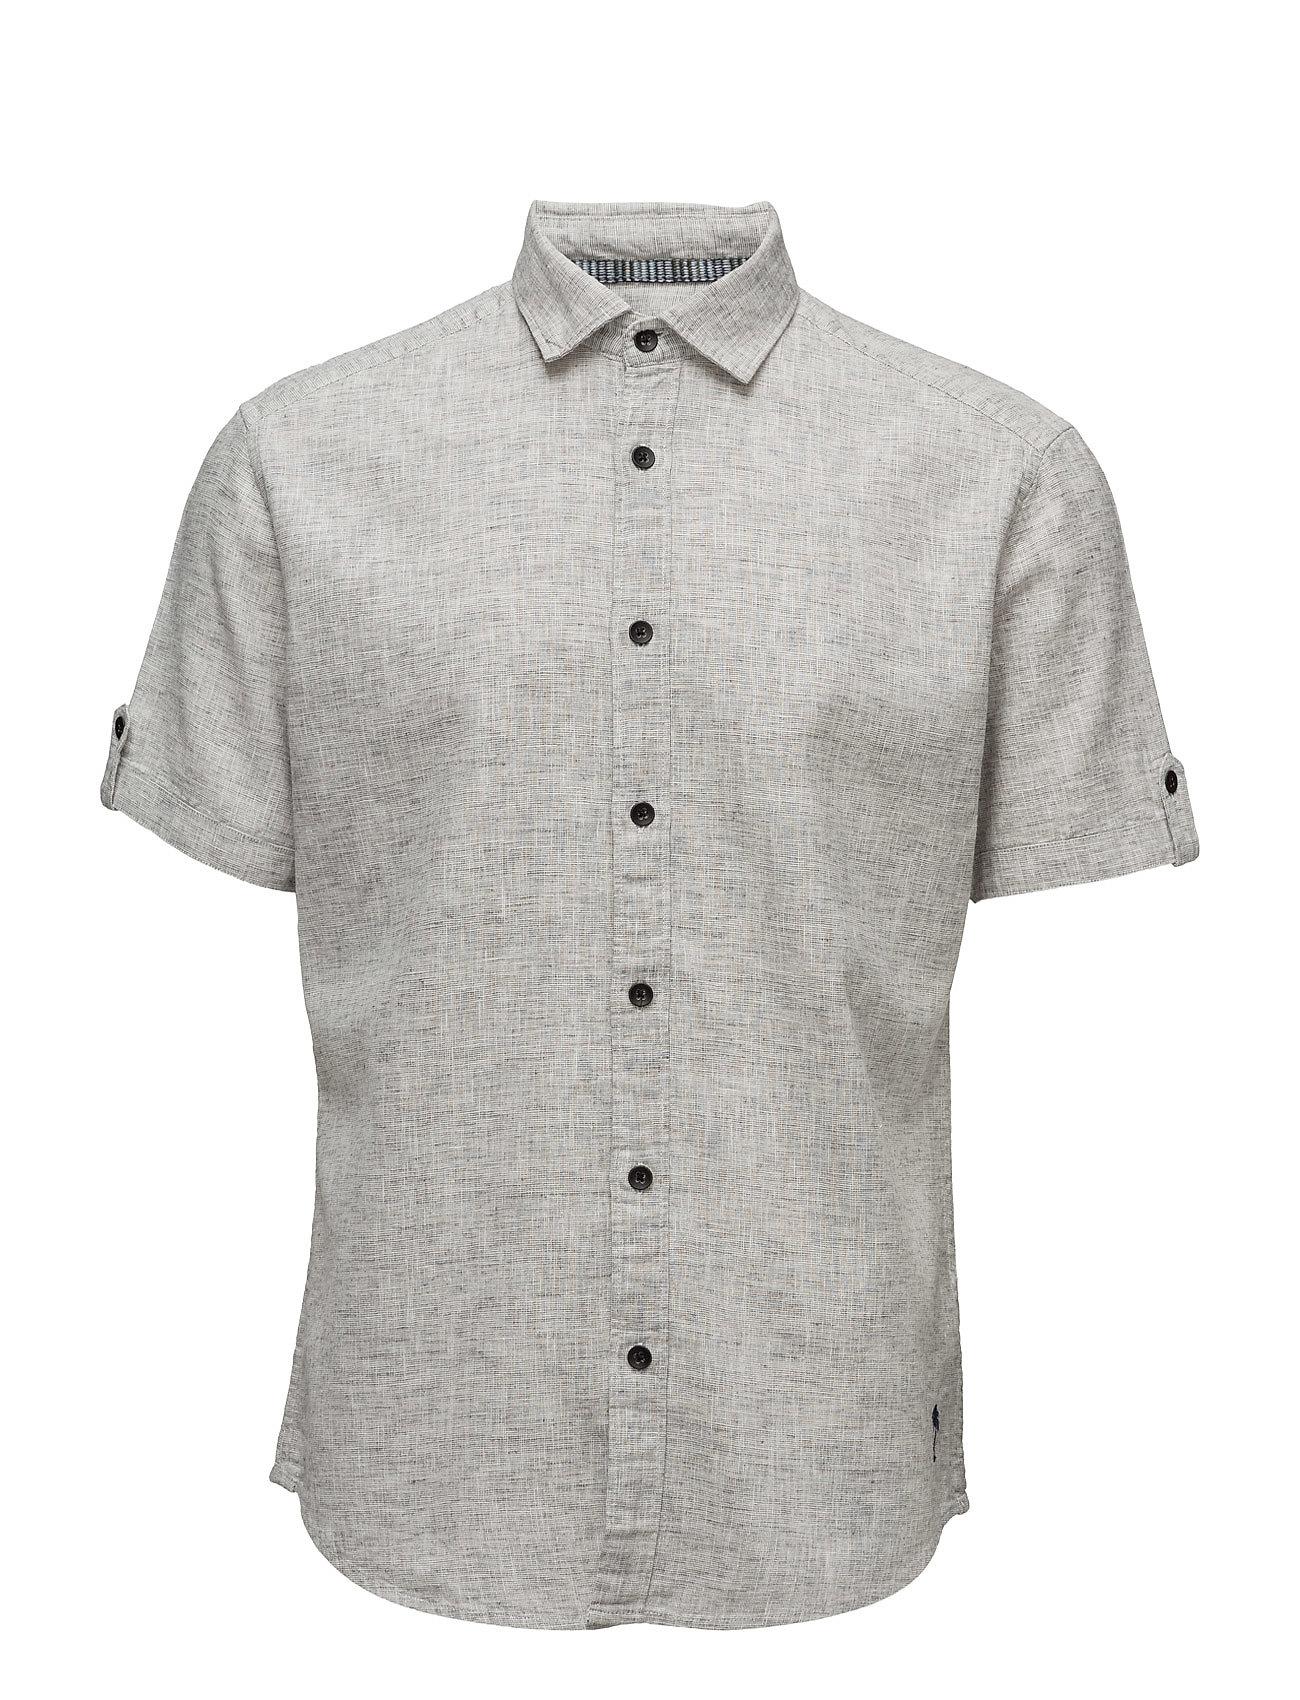 Shirts Woven Esprit Casual Kort-Hylsa